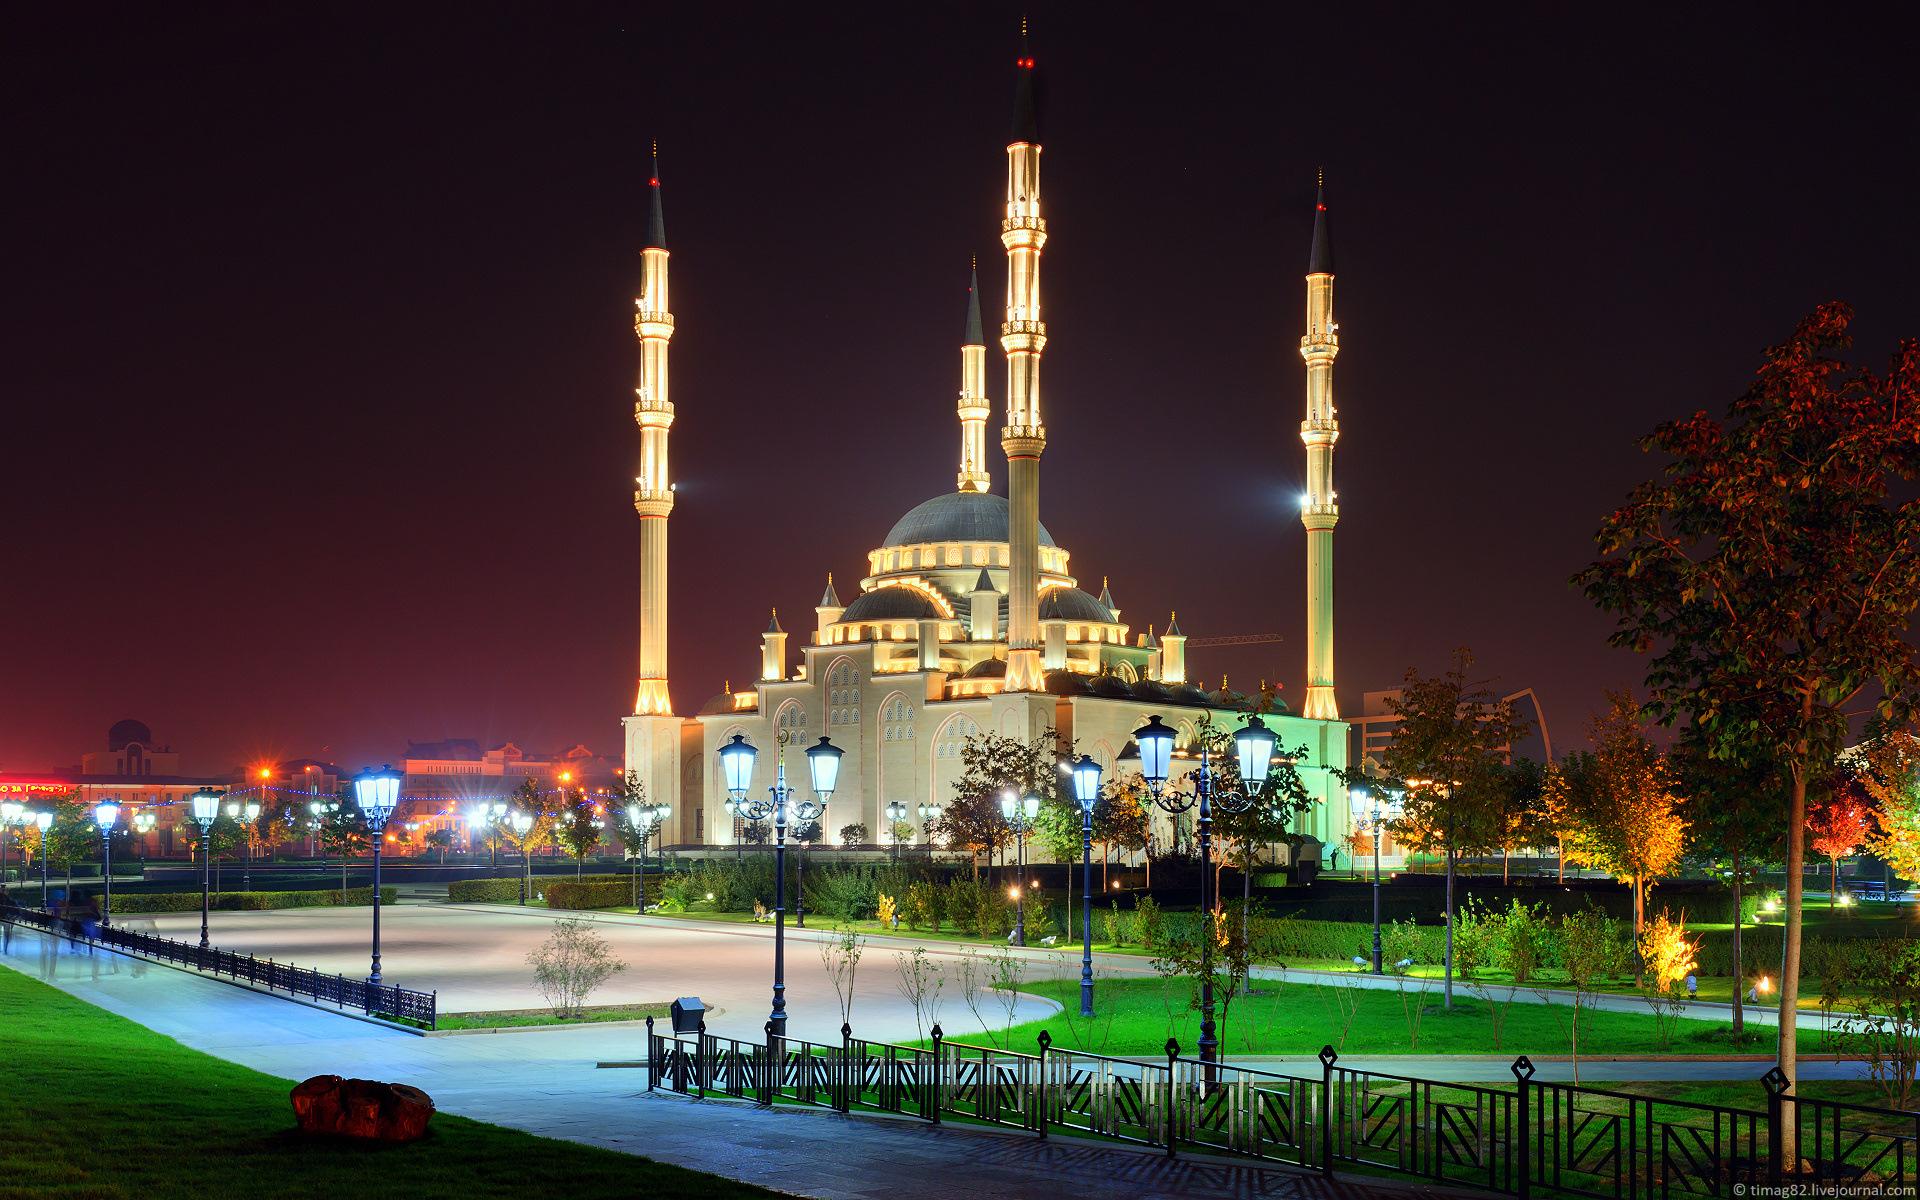 https://i0.wp.com/russiatrek.org/blog/wp-content/uploads/2012/01/grozny-city-at-night-time-11.jpg